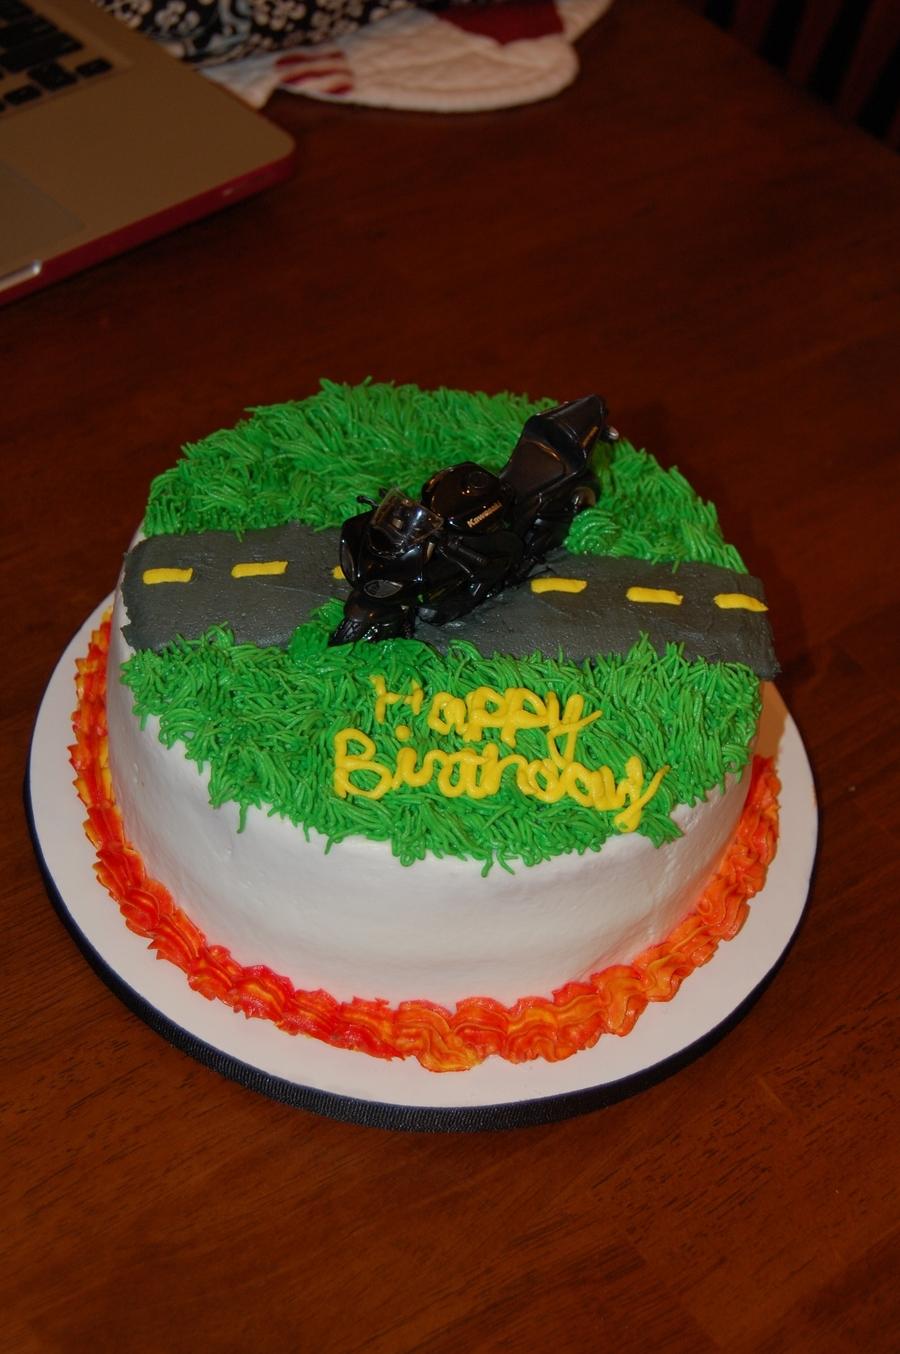 Astounding Motorcycle Birthday Cake Cakecentral Com Funny Birthday Cards Online Alyptdamsfinfo